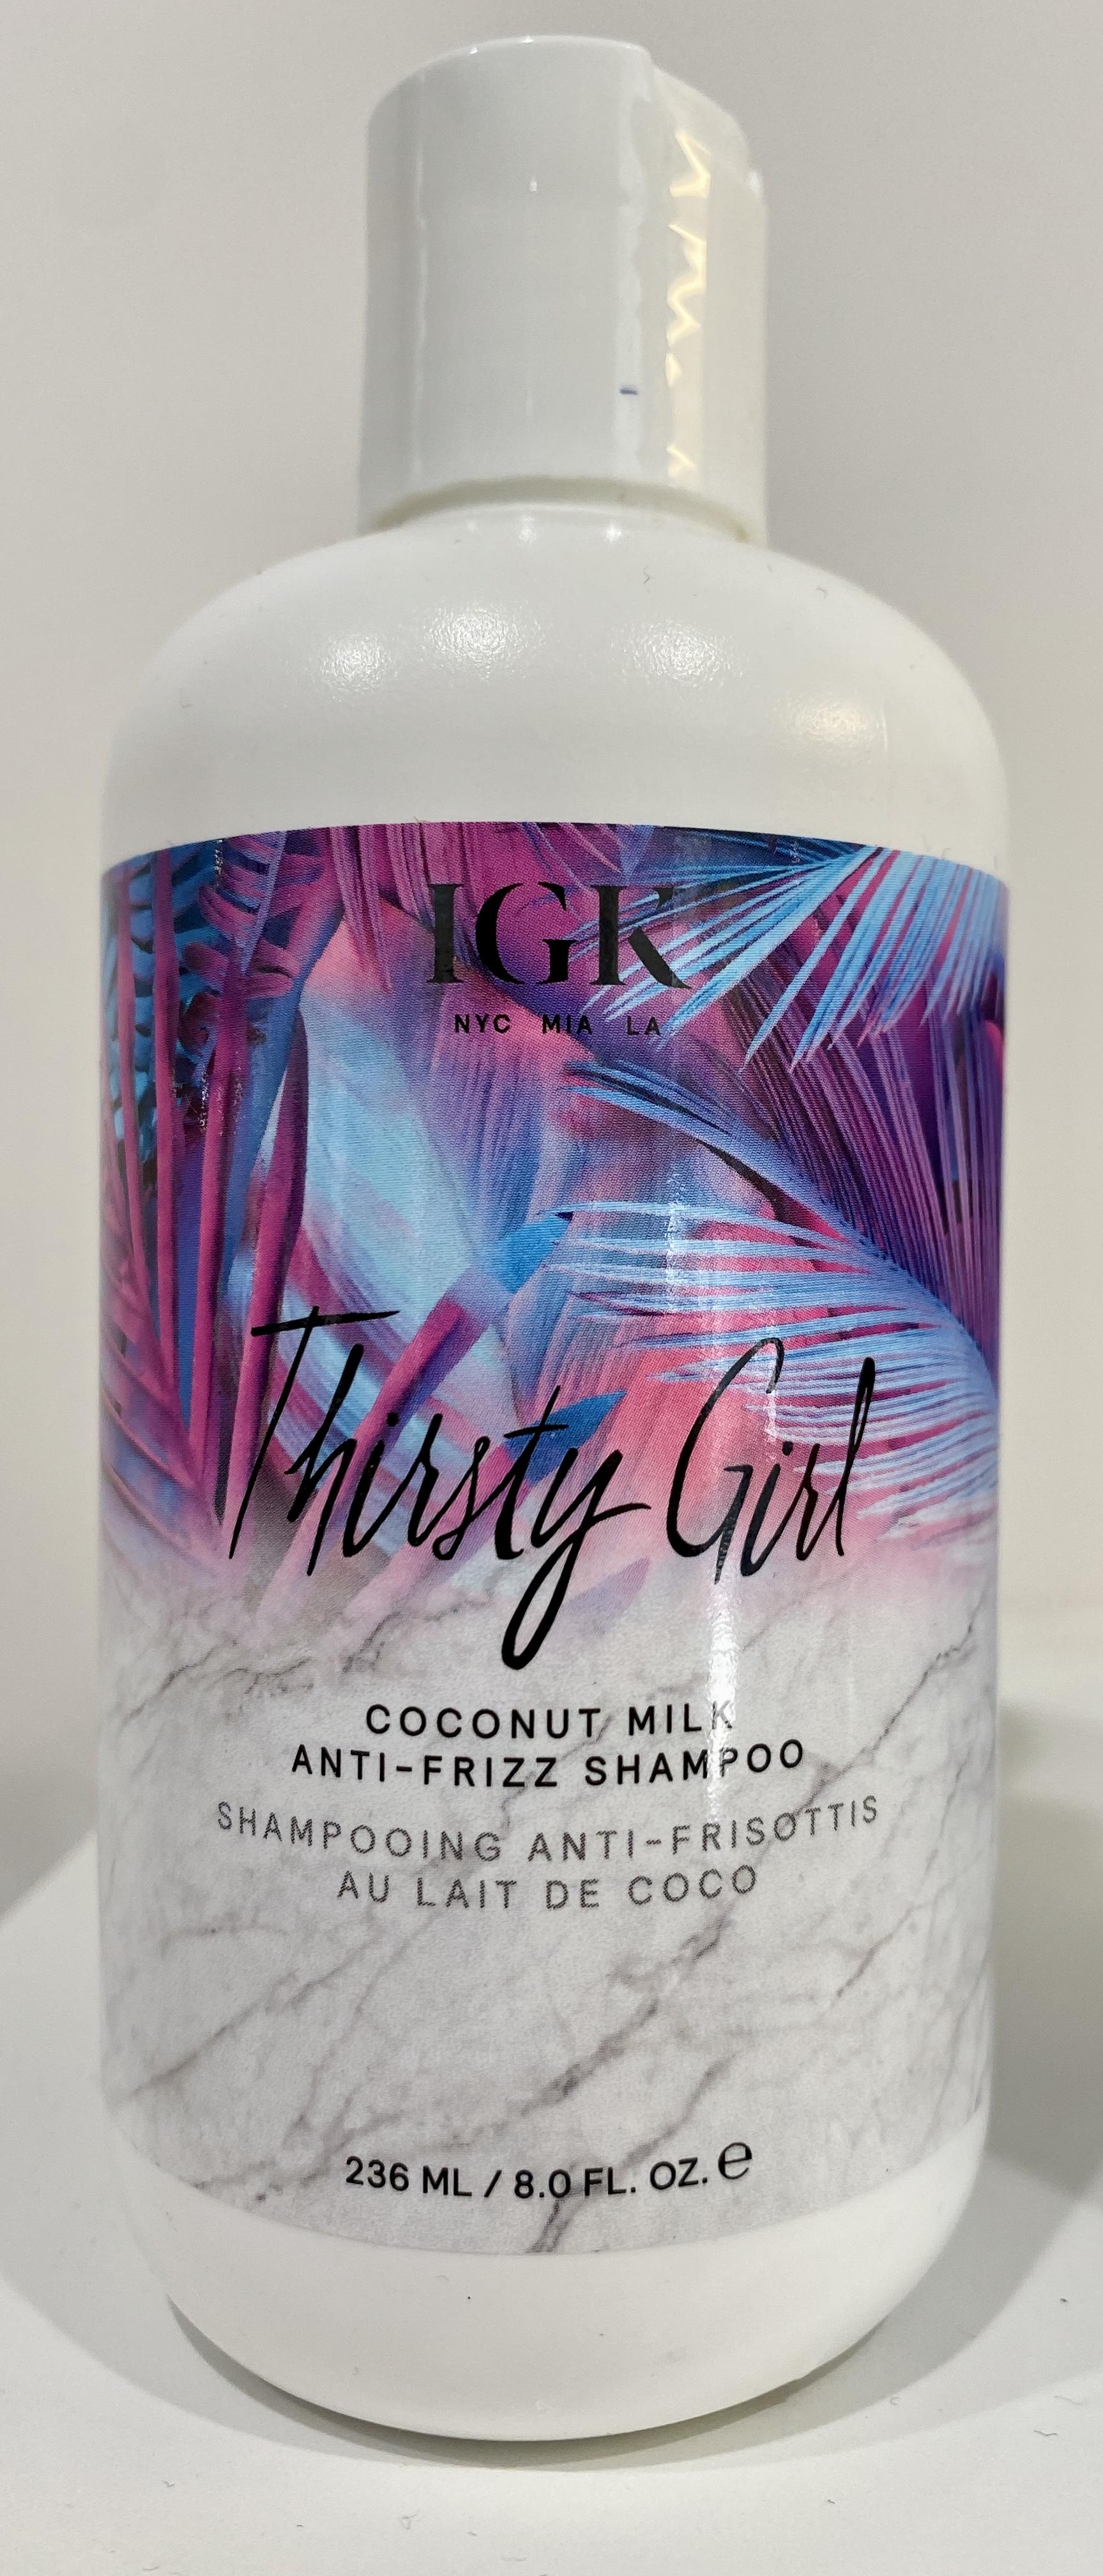 Thirsty Girl Shampoo